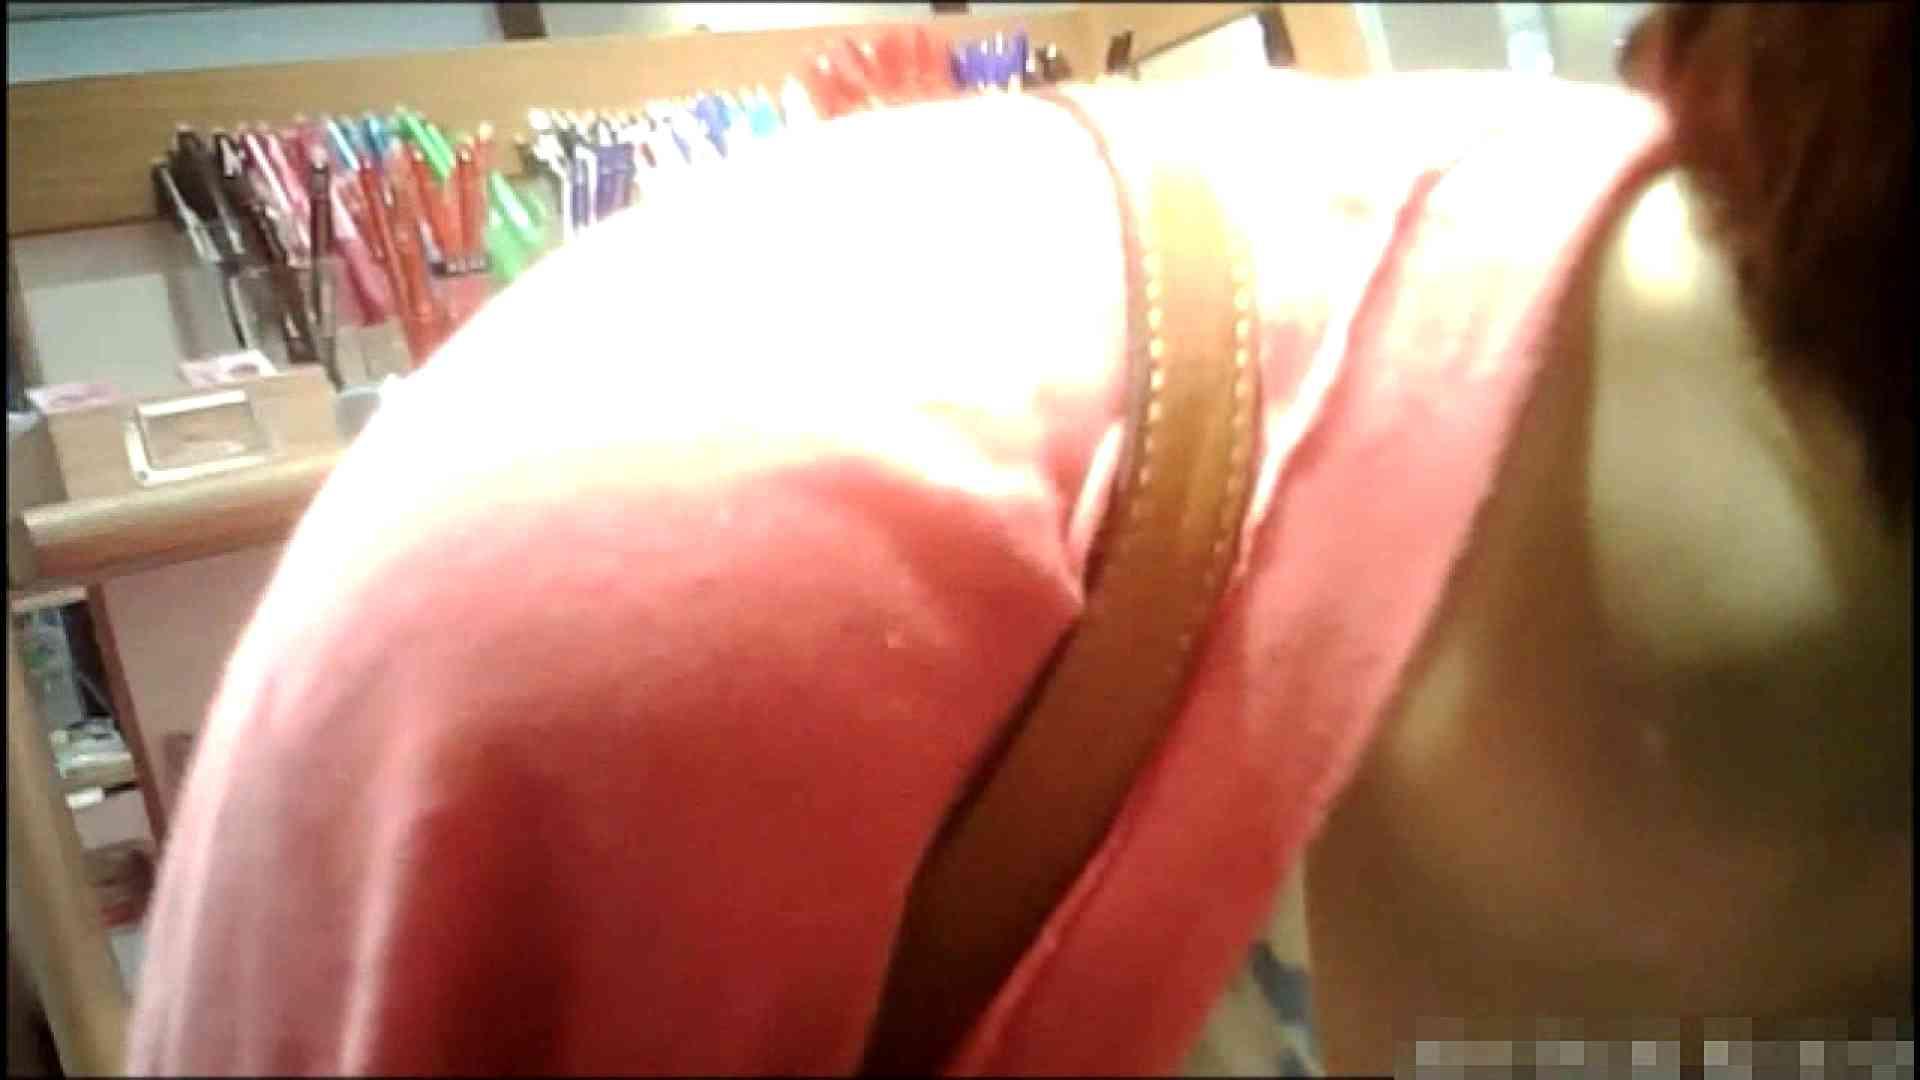 NO.1 普段から胸元がゆるい友達【某ファッションビル内の雑貨屋】 友人 | 胸チラ  68連発 64